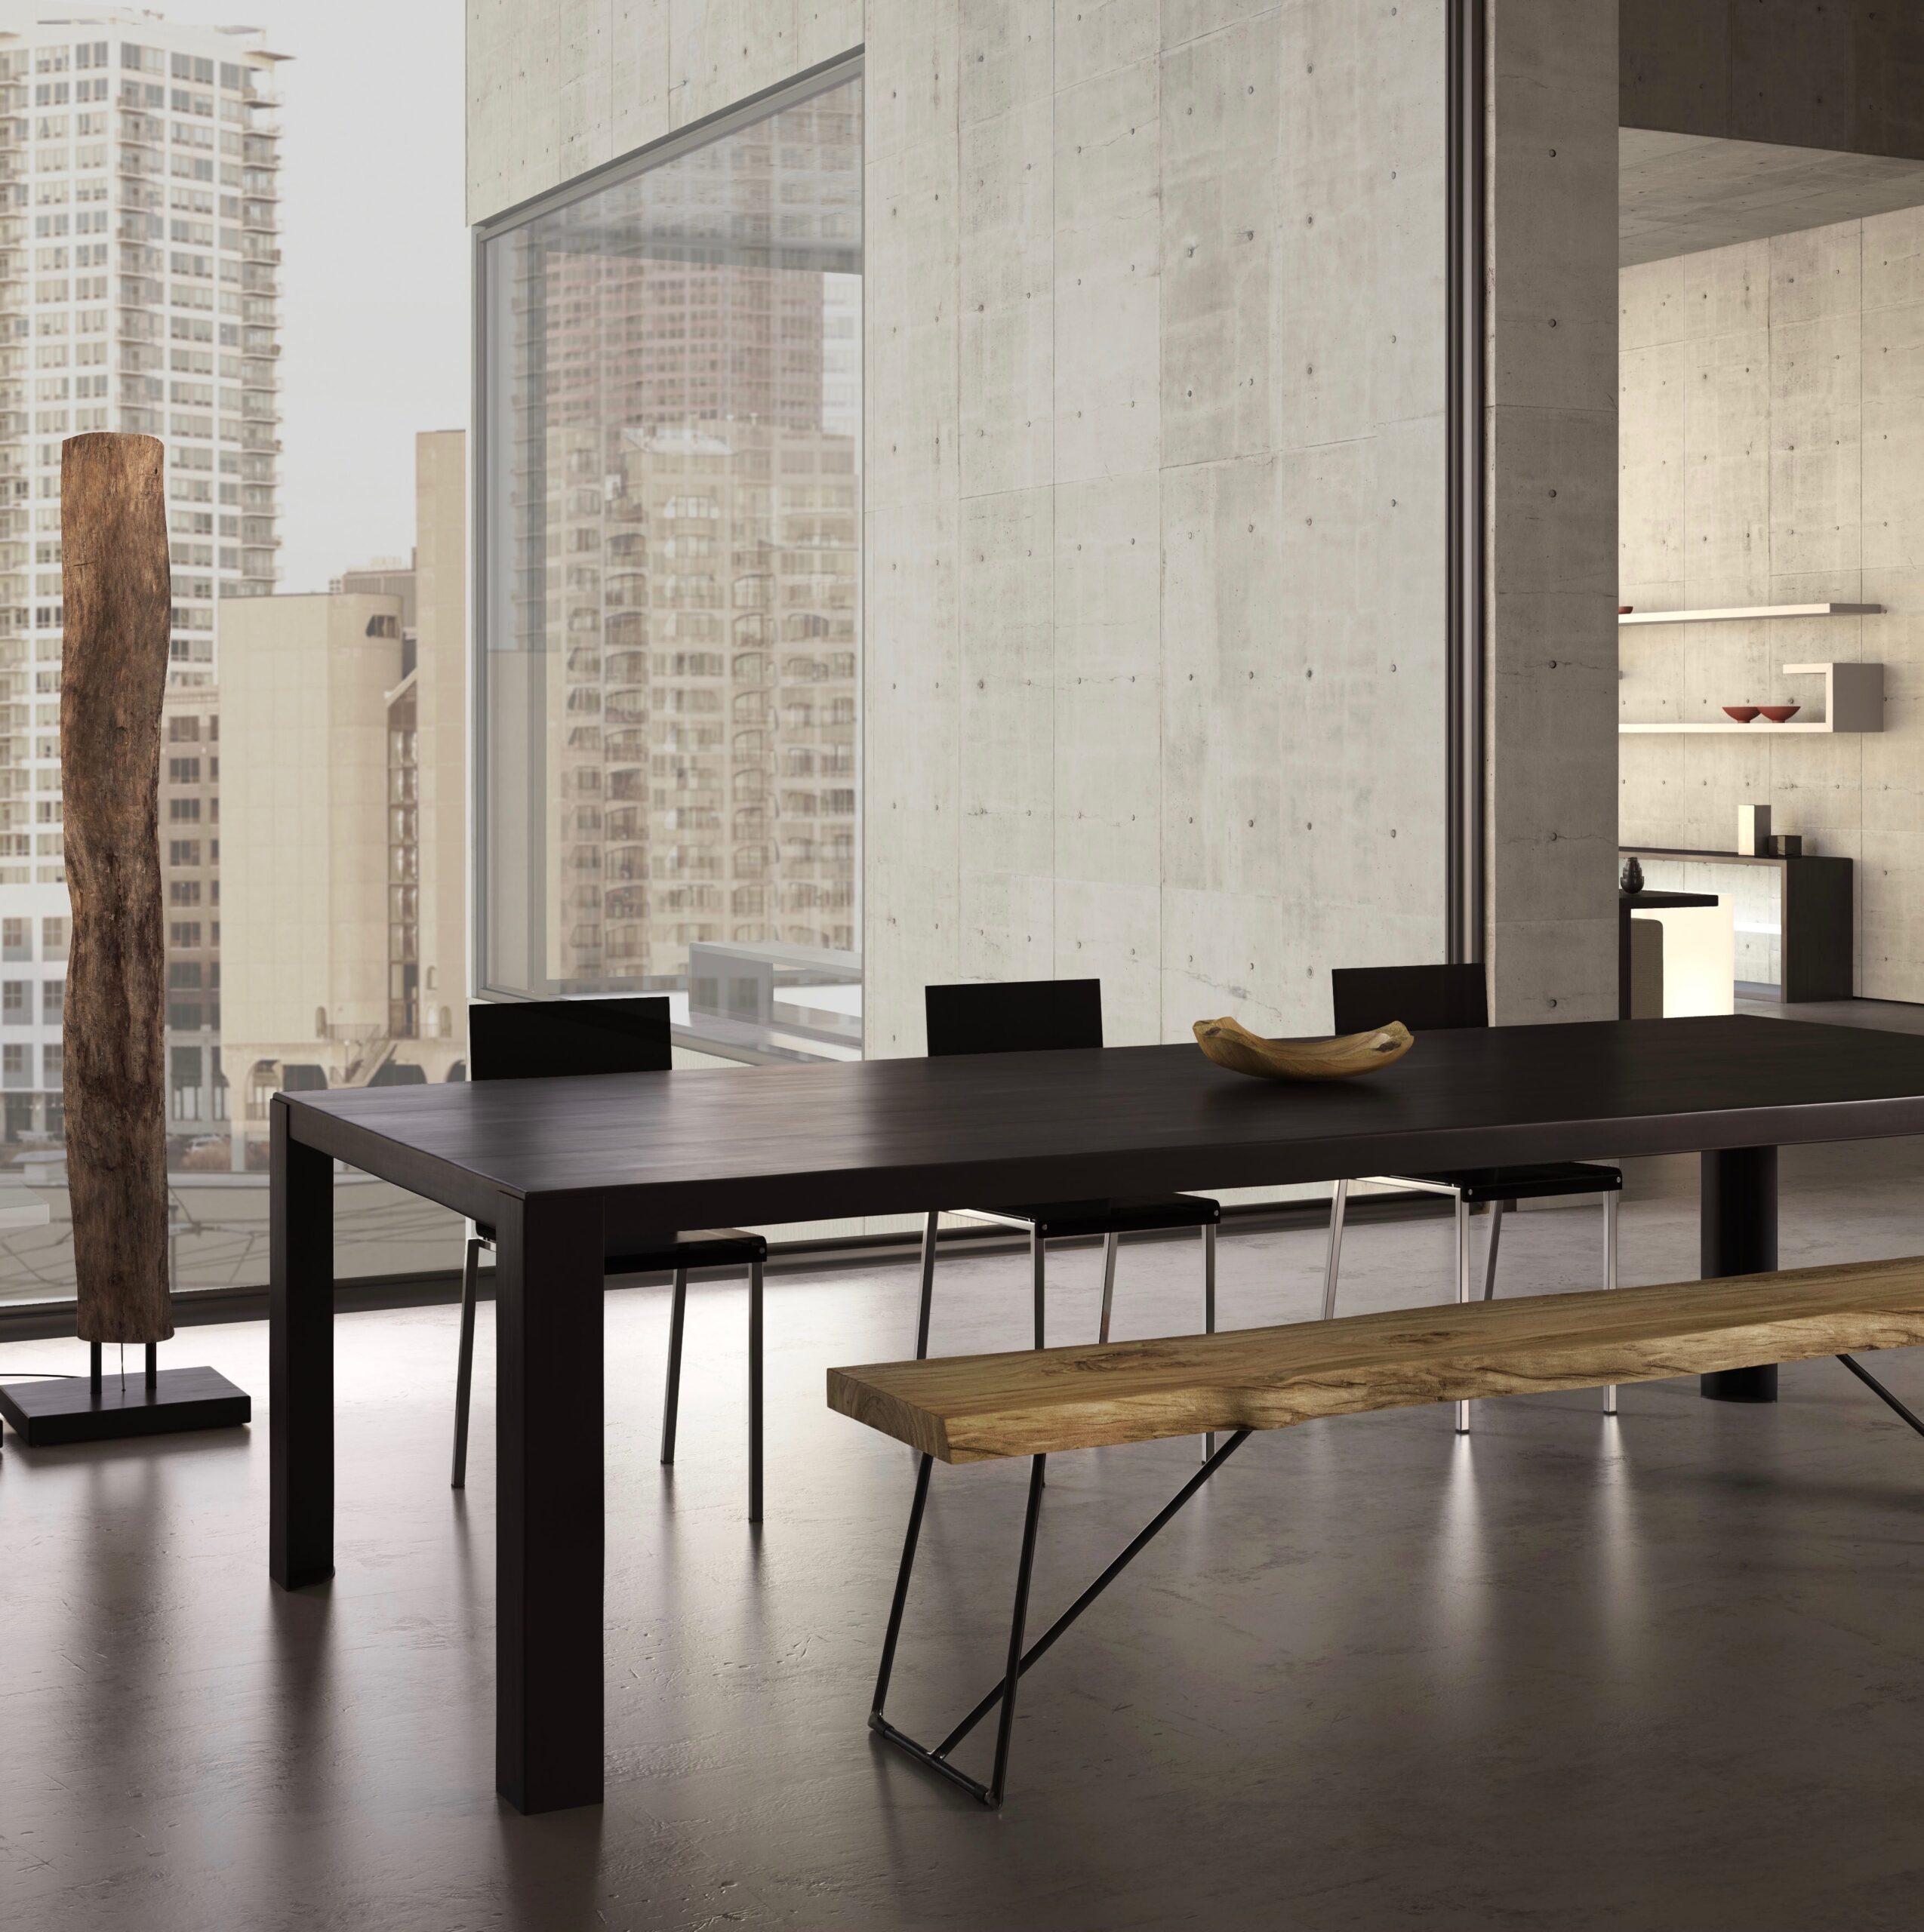 table rectangulaire big irony acier phosphate noir madeindesign - blog déco - clemaroundthecorner